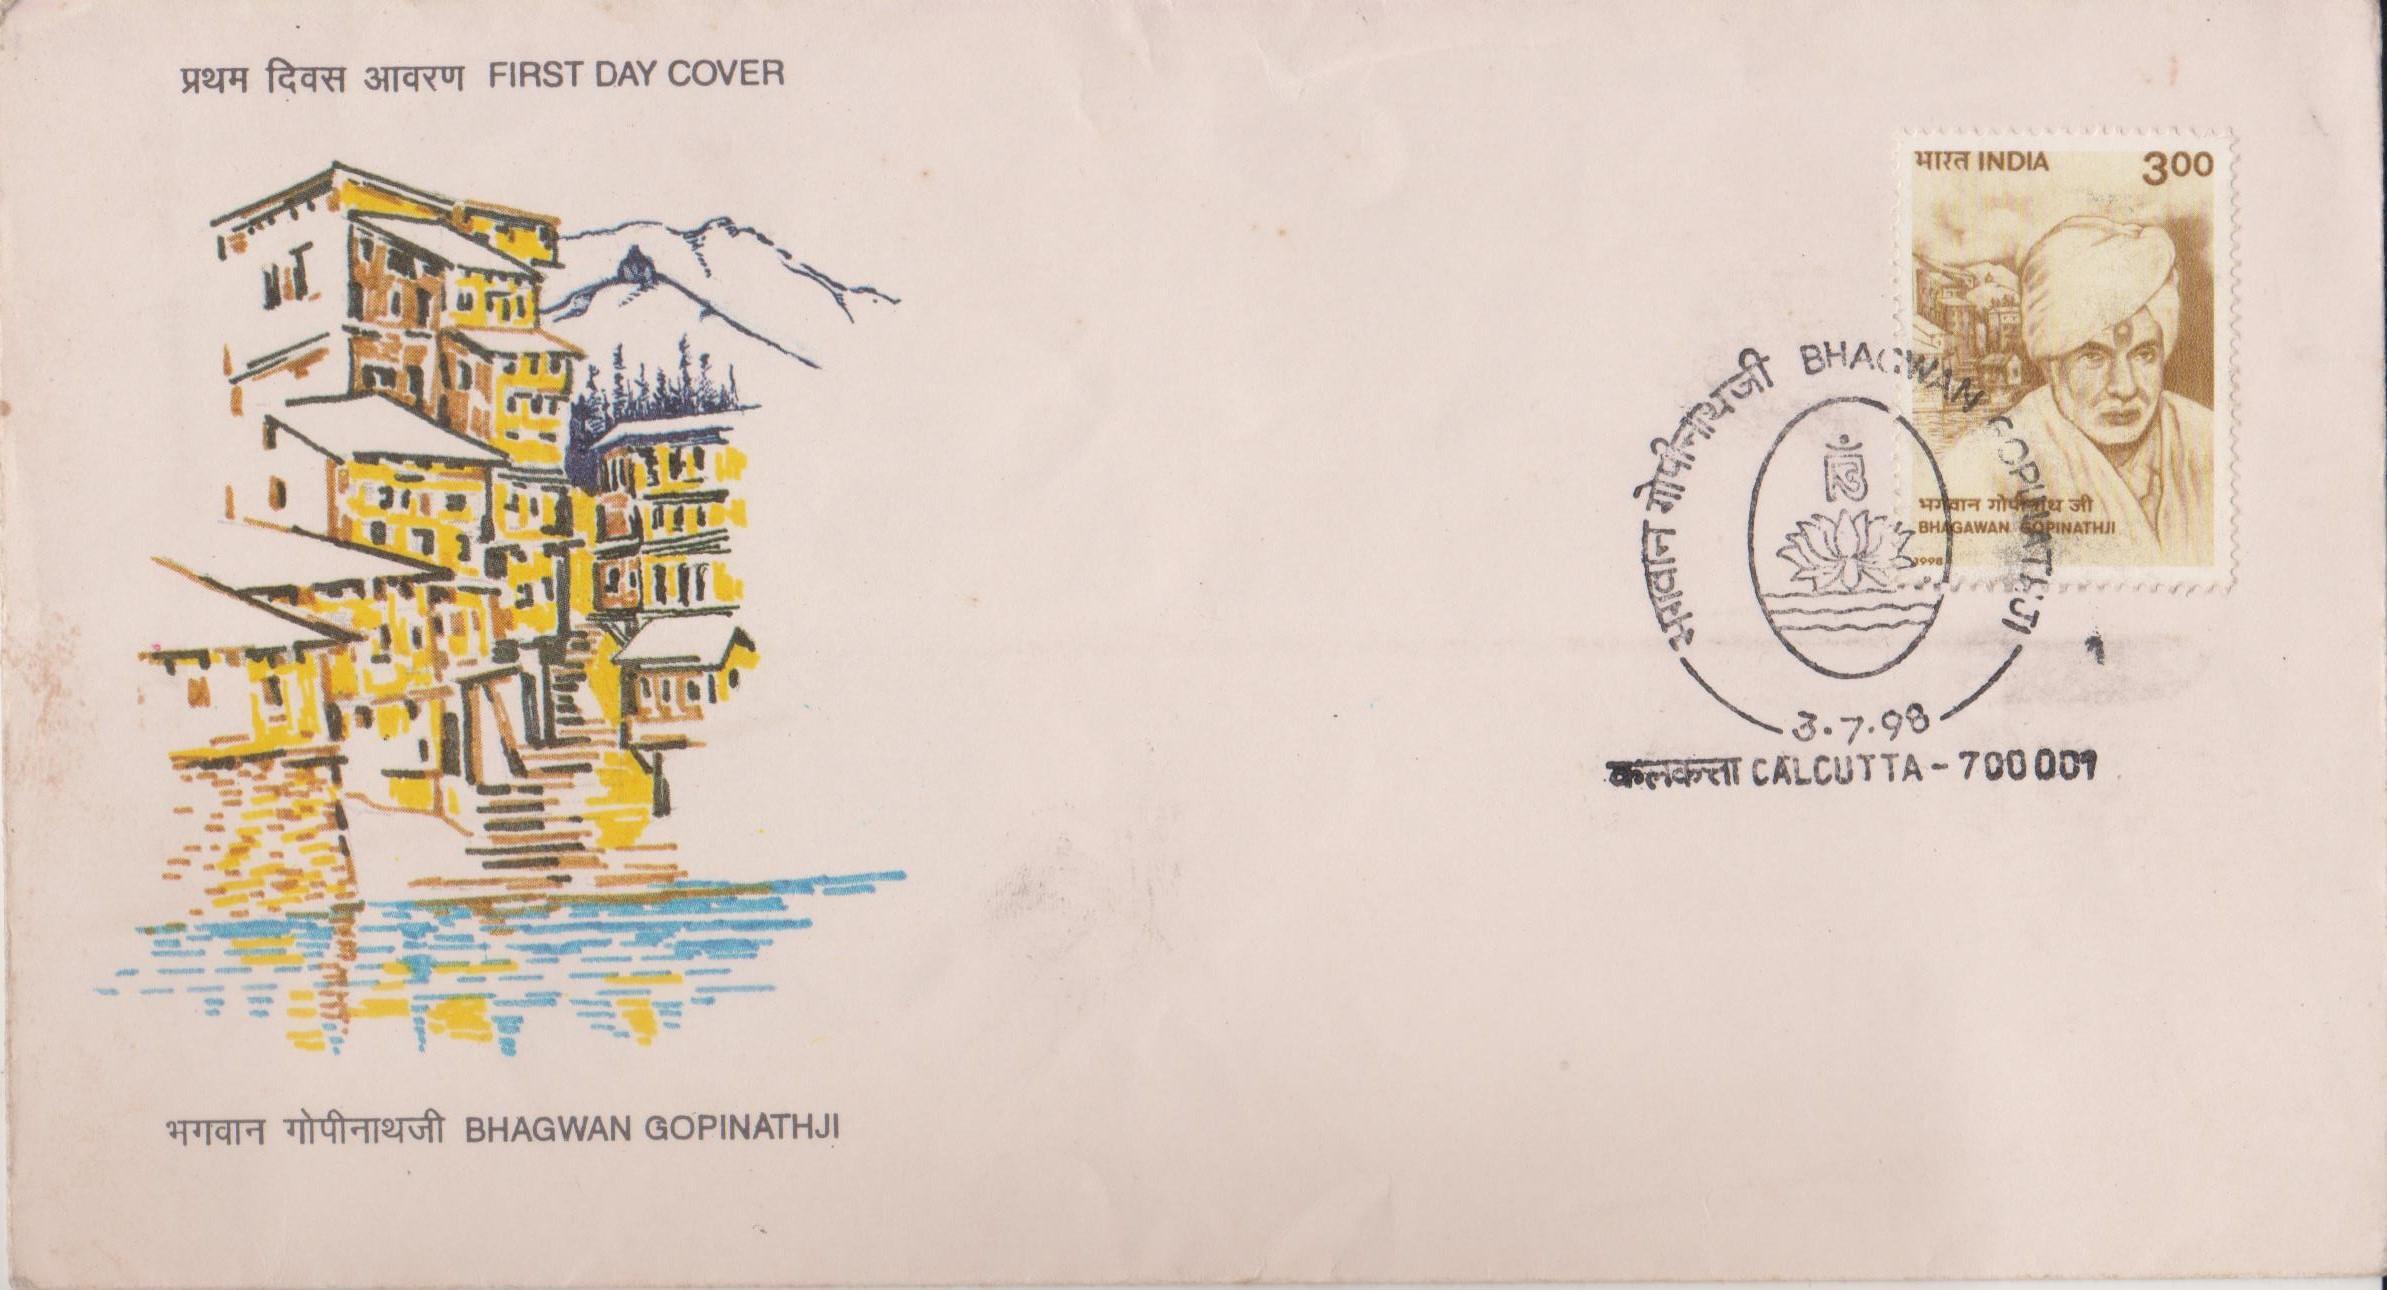 Aghoreshwar Bhagwan Gopinath Ji